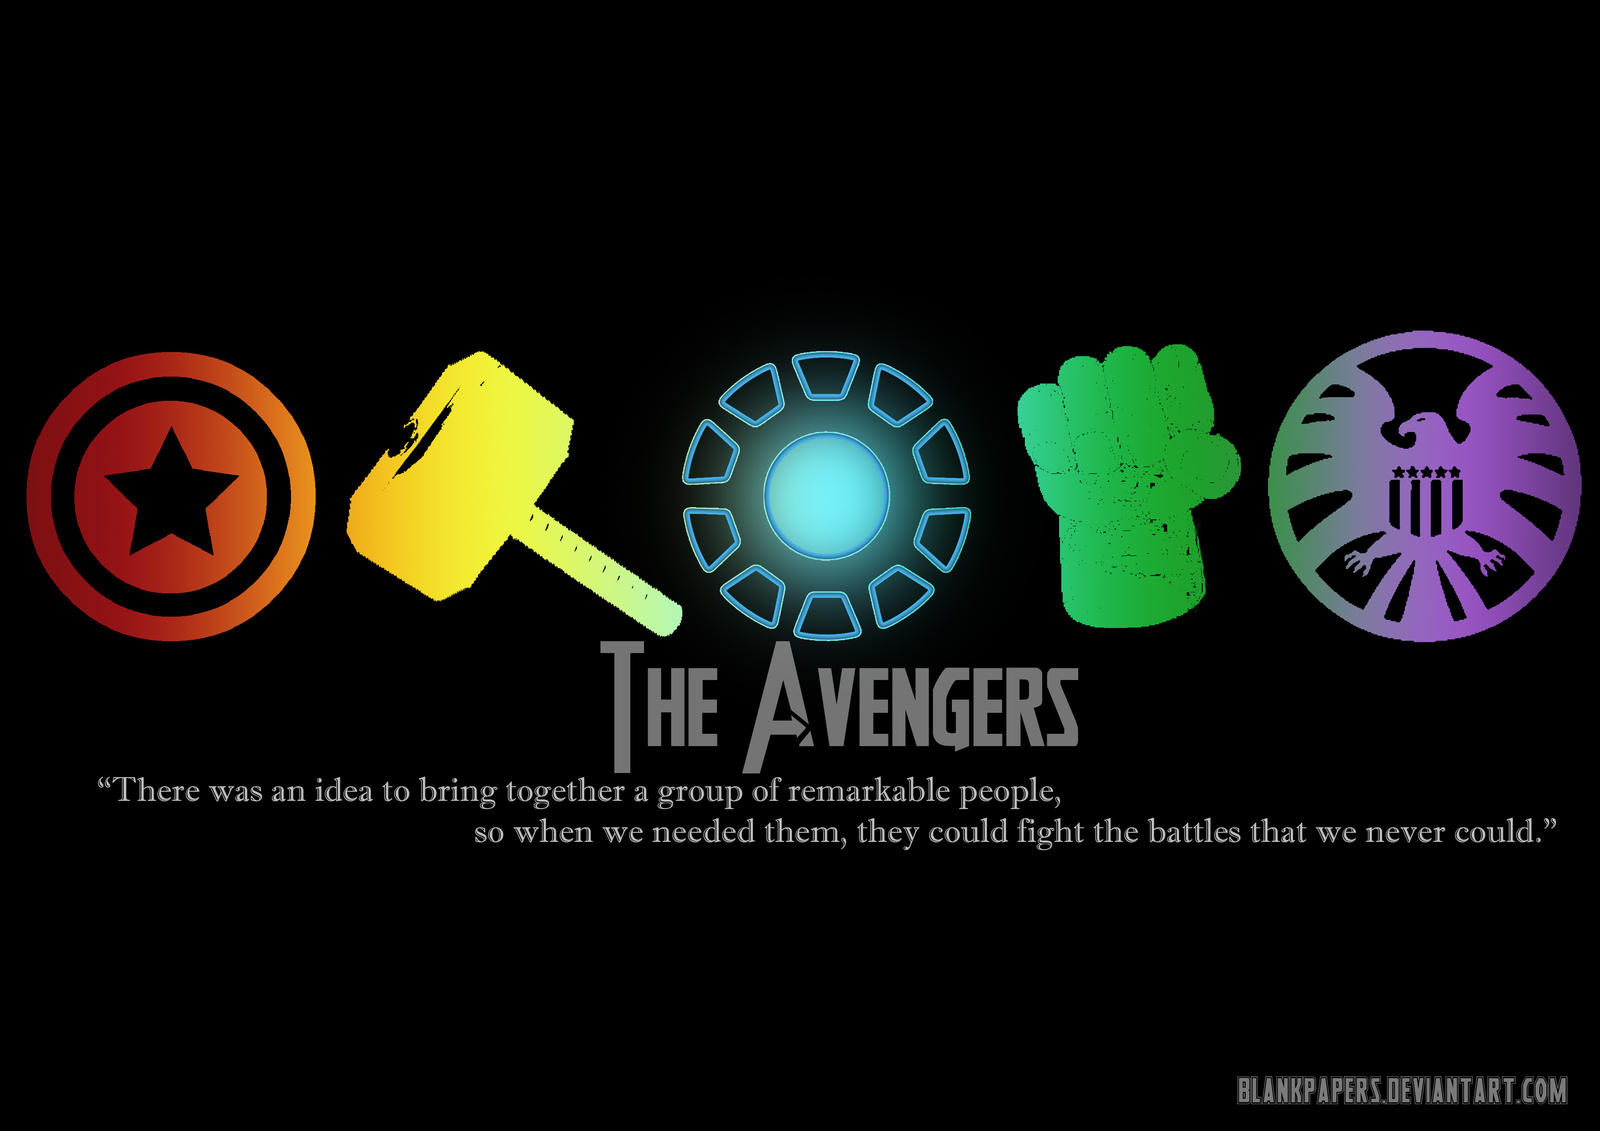 avengers comic logo wallpaper - photo #44